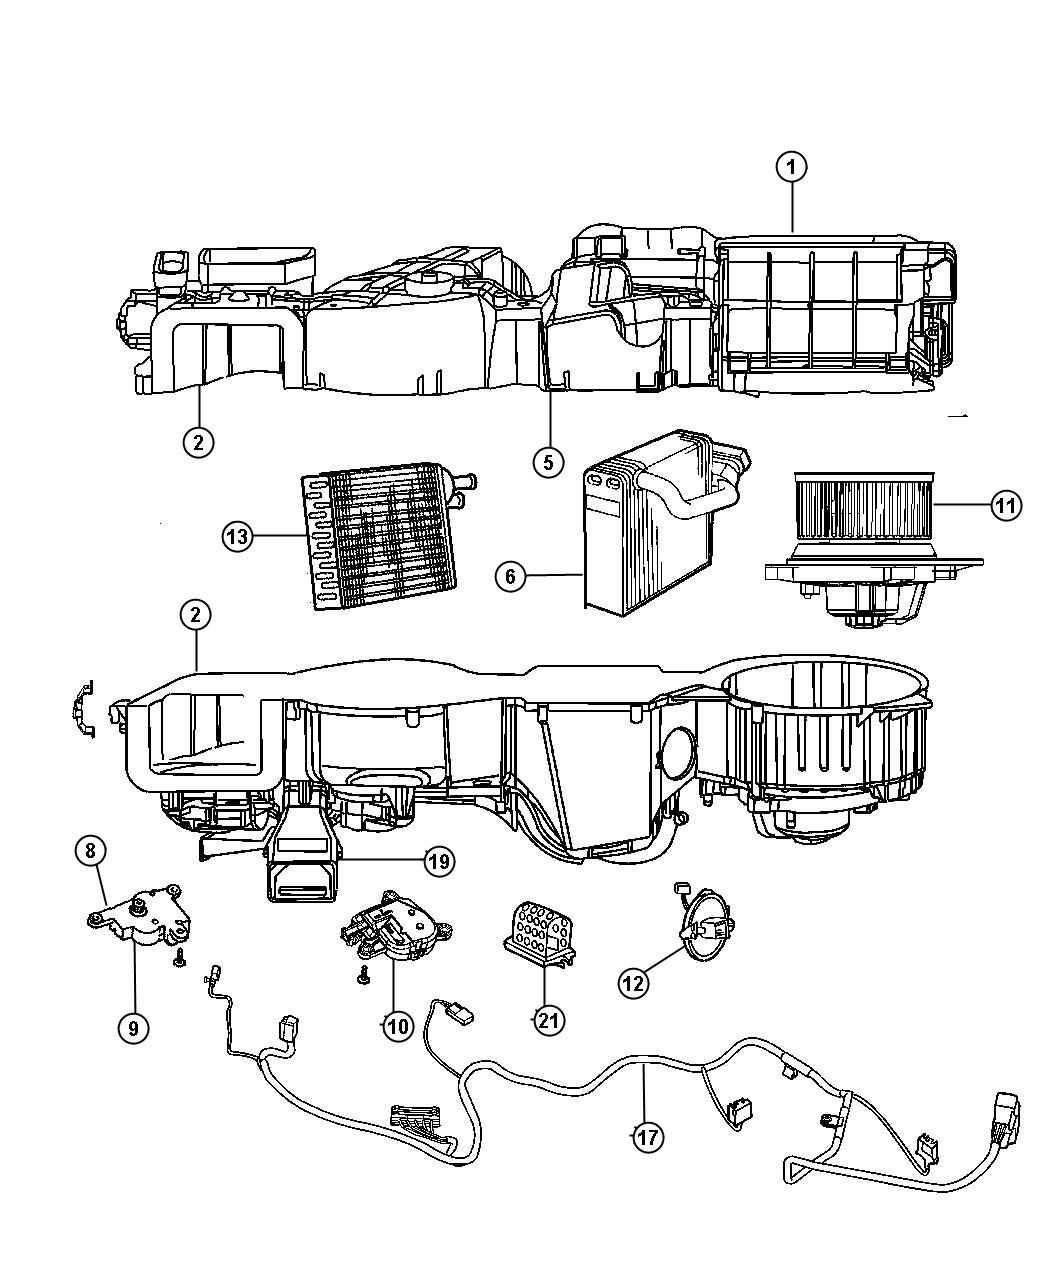 2000 Chrysler Sebring Jxi Convertible Engine Diagram